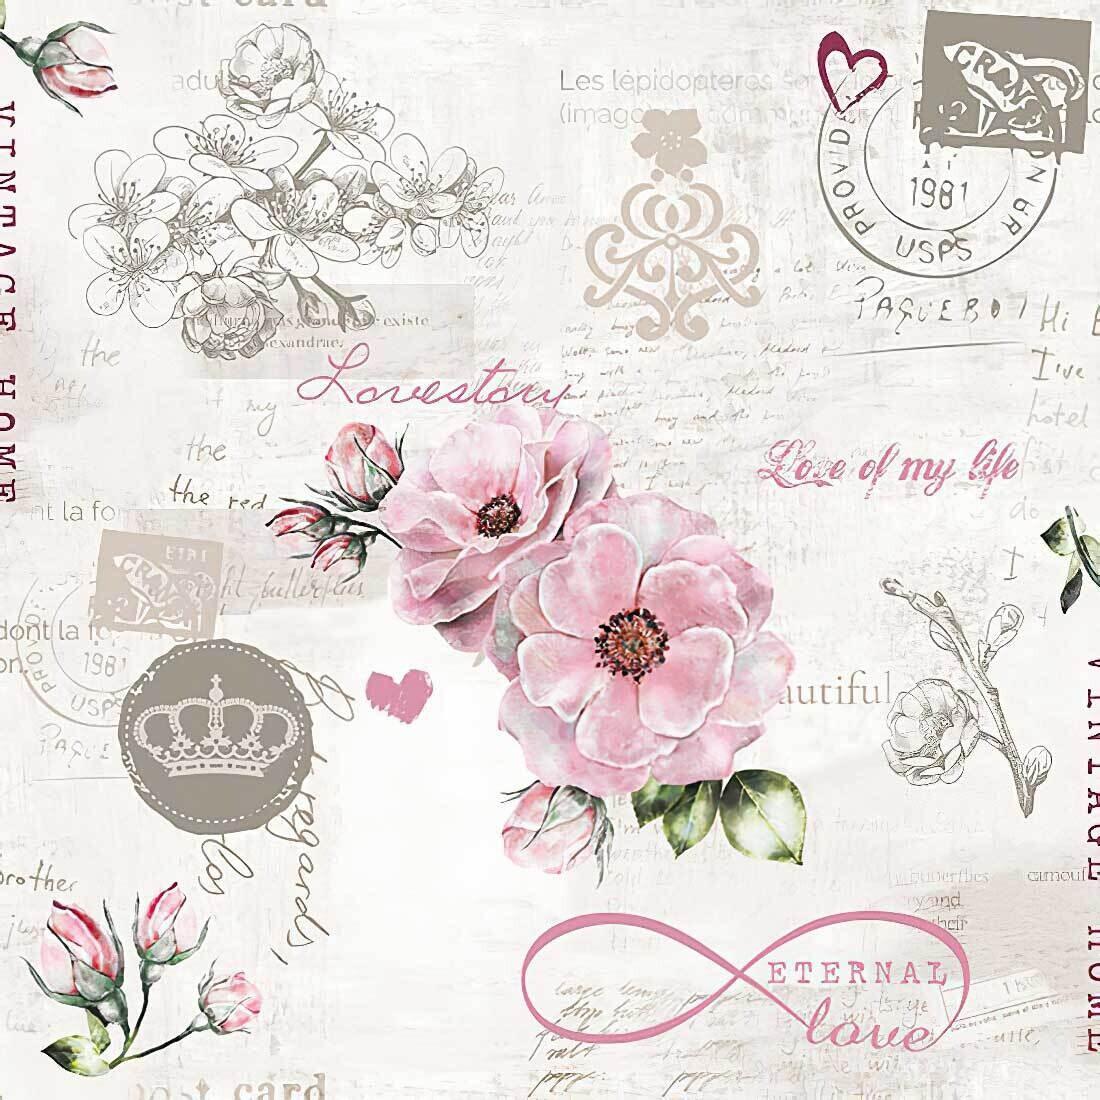 Decoupage Paper Napkins - Floral - Eternal Love 13x13 (1 Sheet)